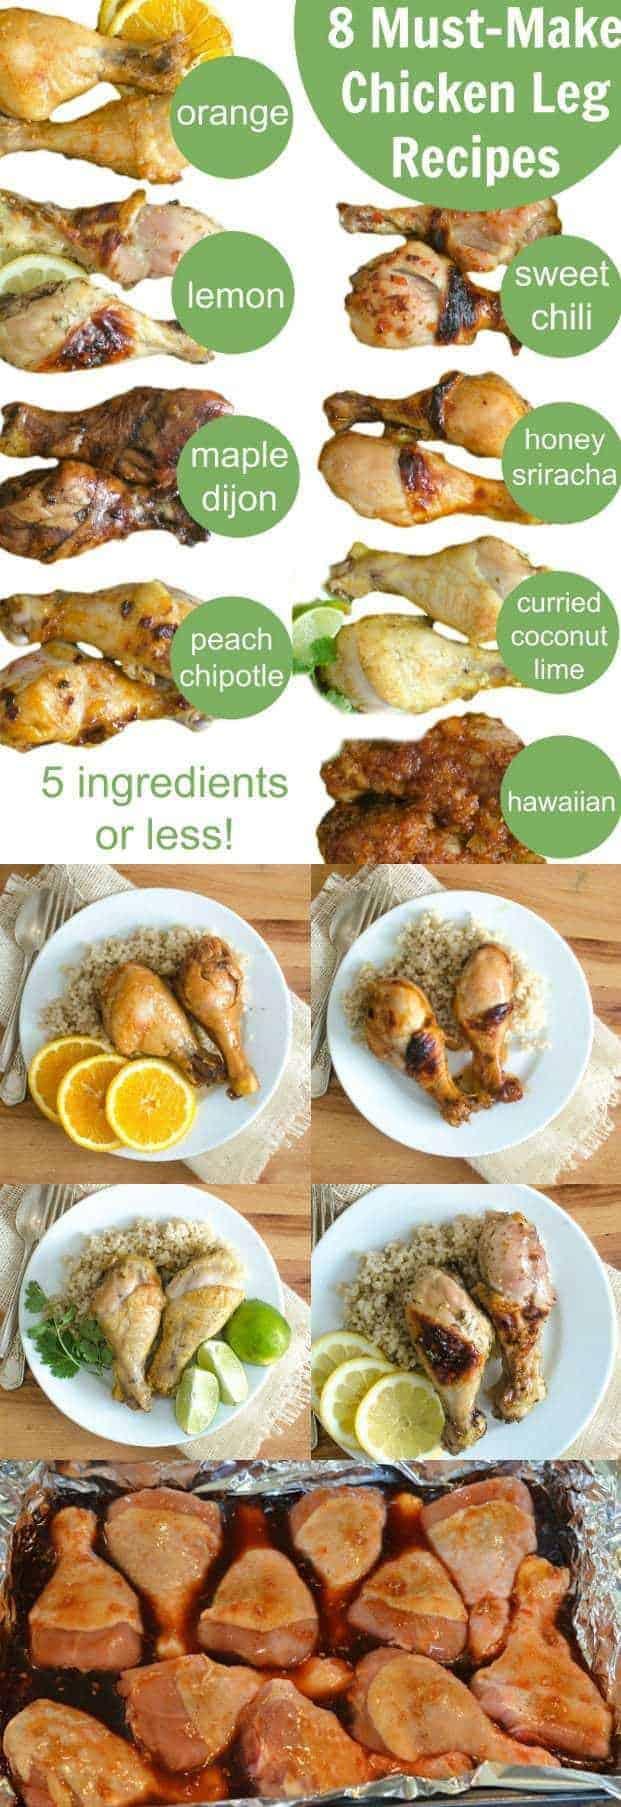 5 Ingredient or Less Chicken Leg Recipes